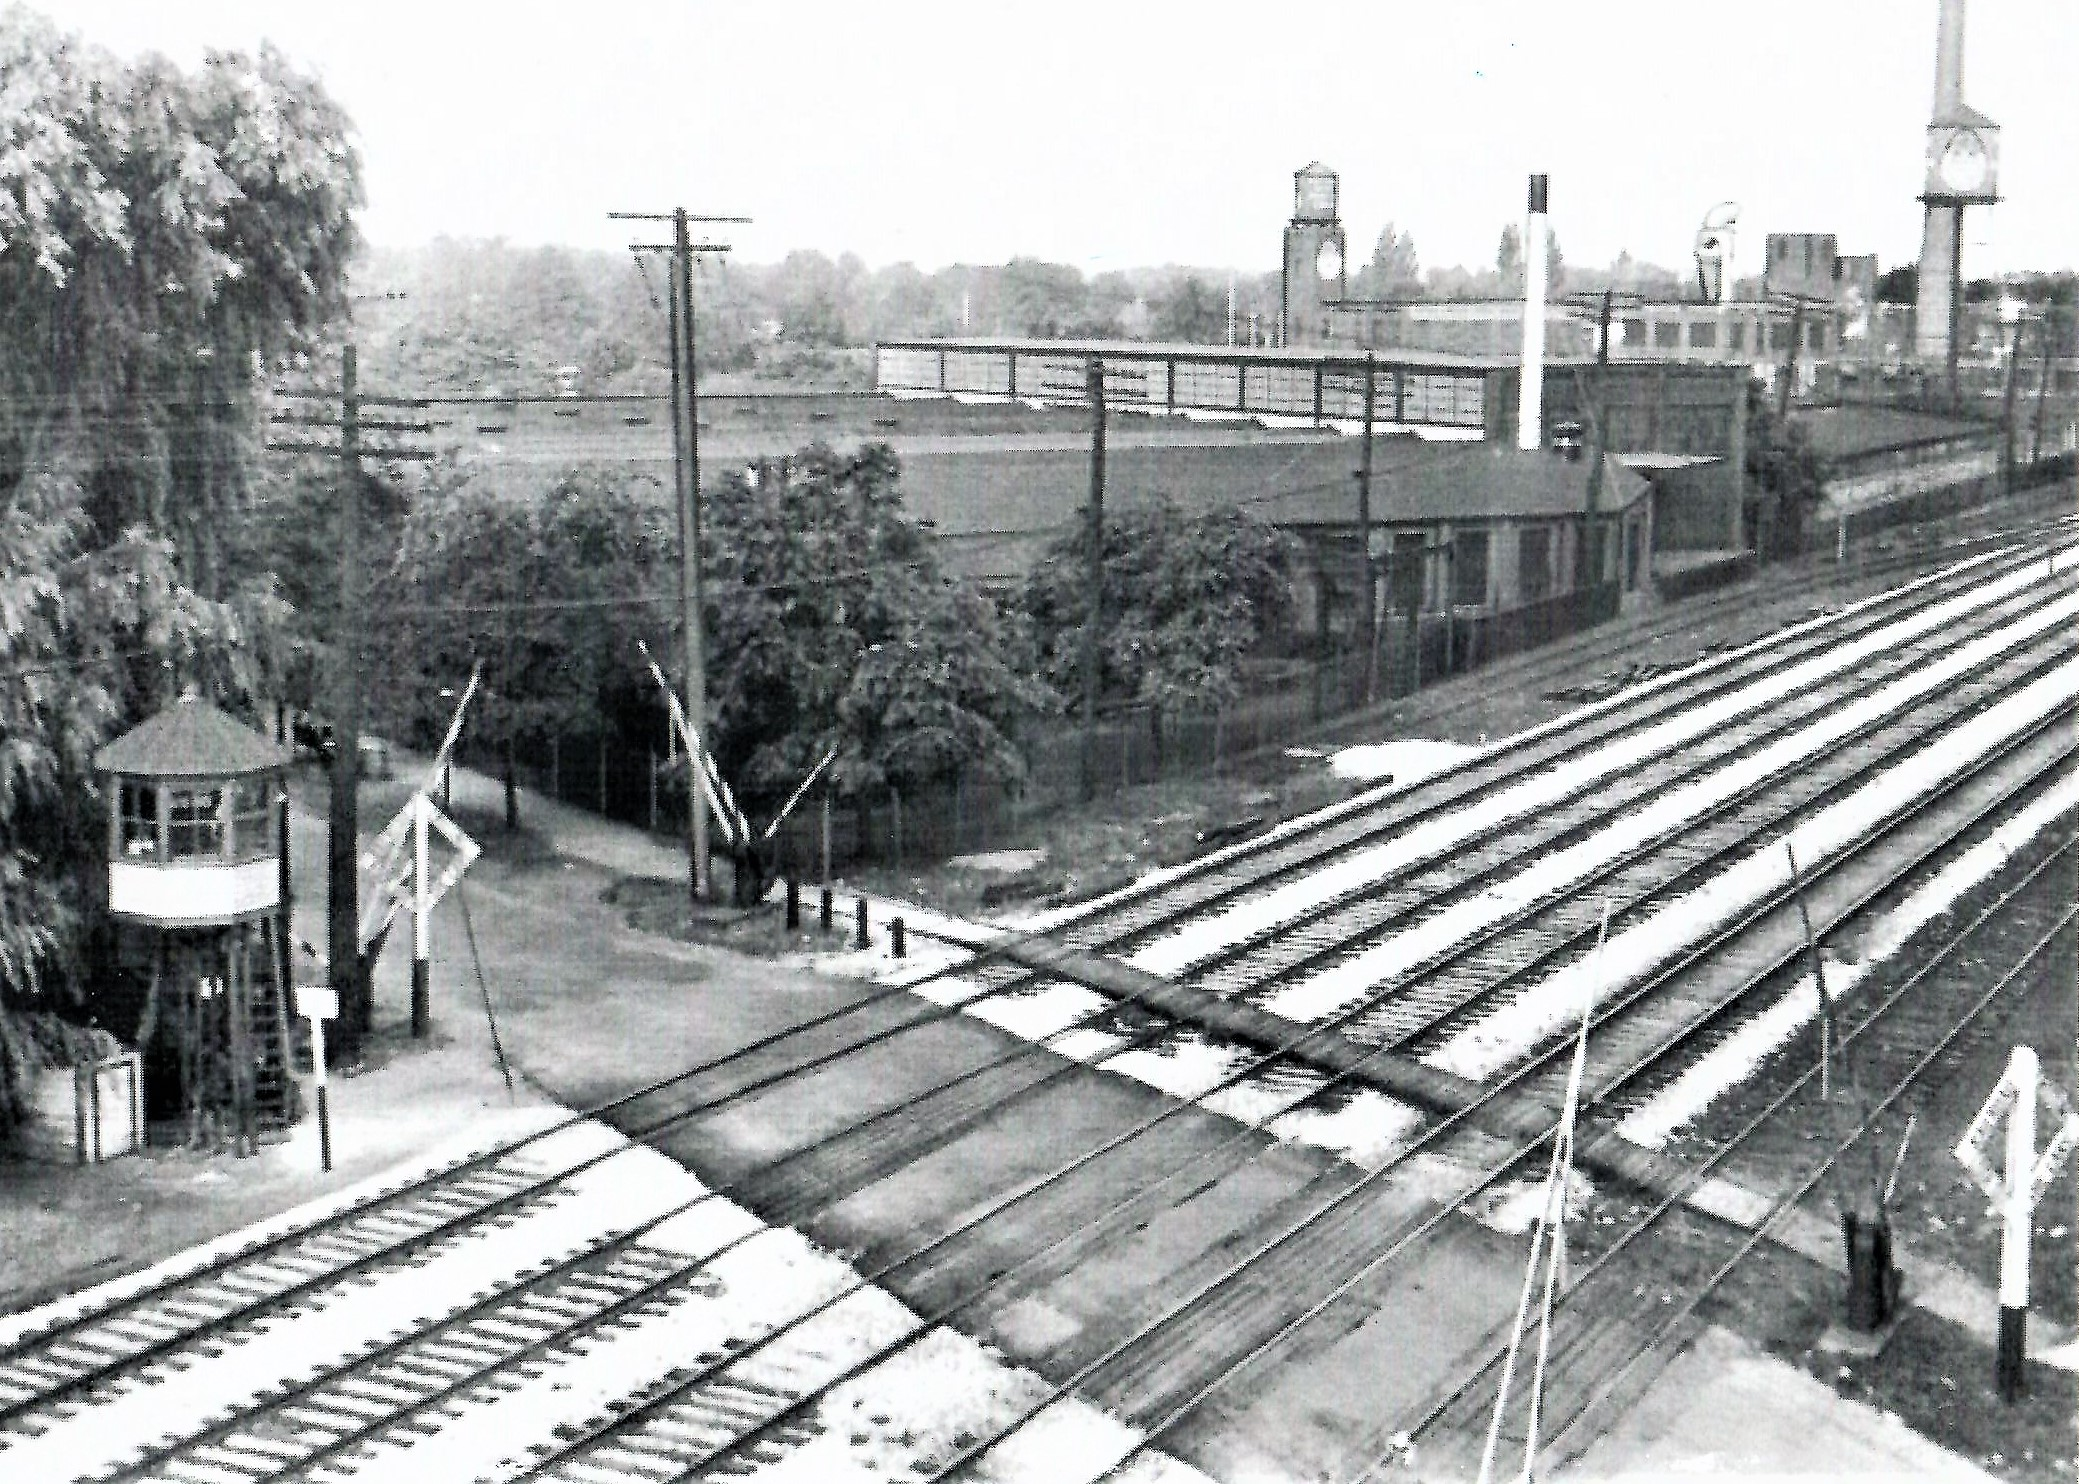 East 105th Railroad Crossing